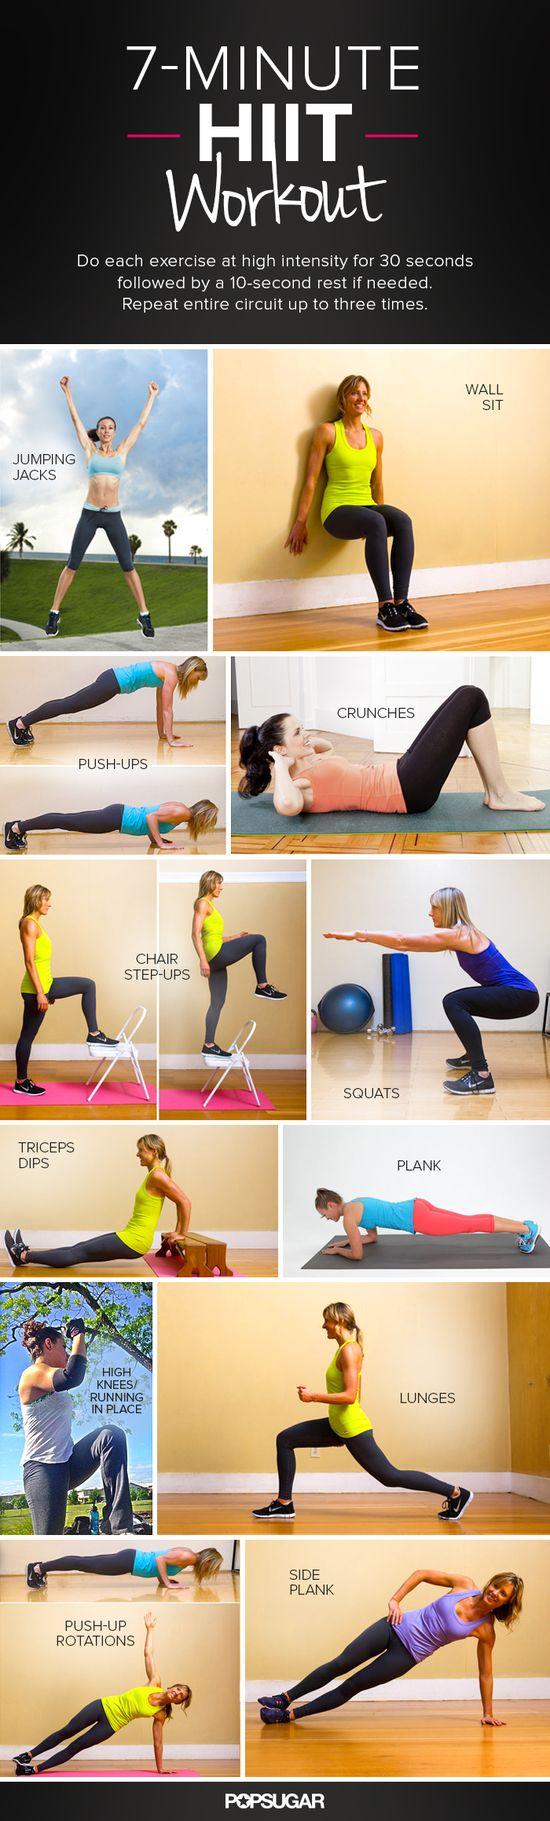 Rutina de Fitness en 7 minutos